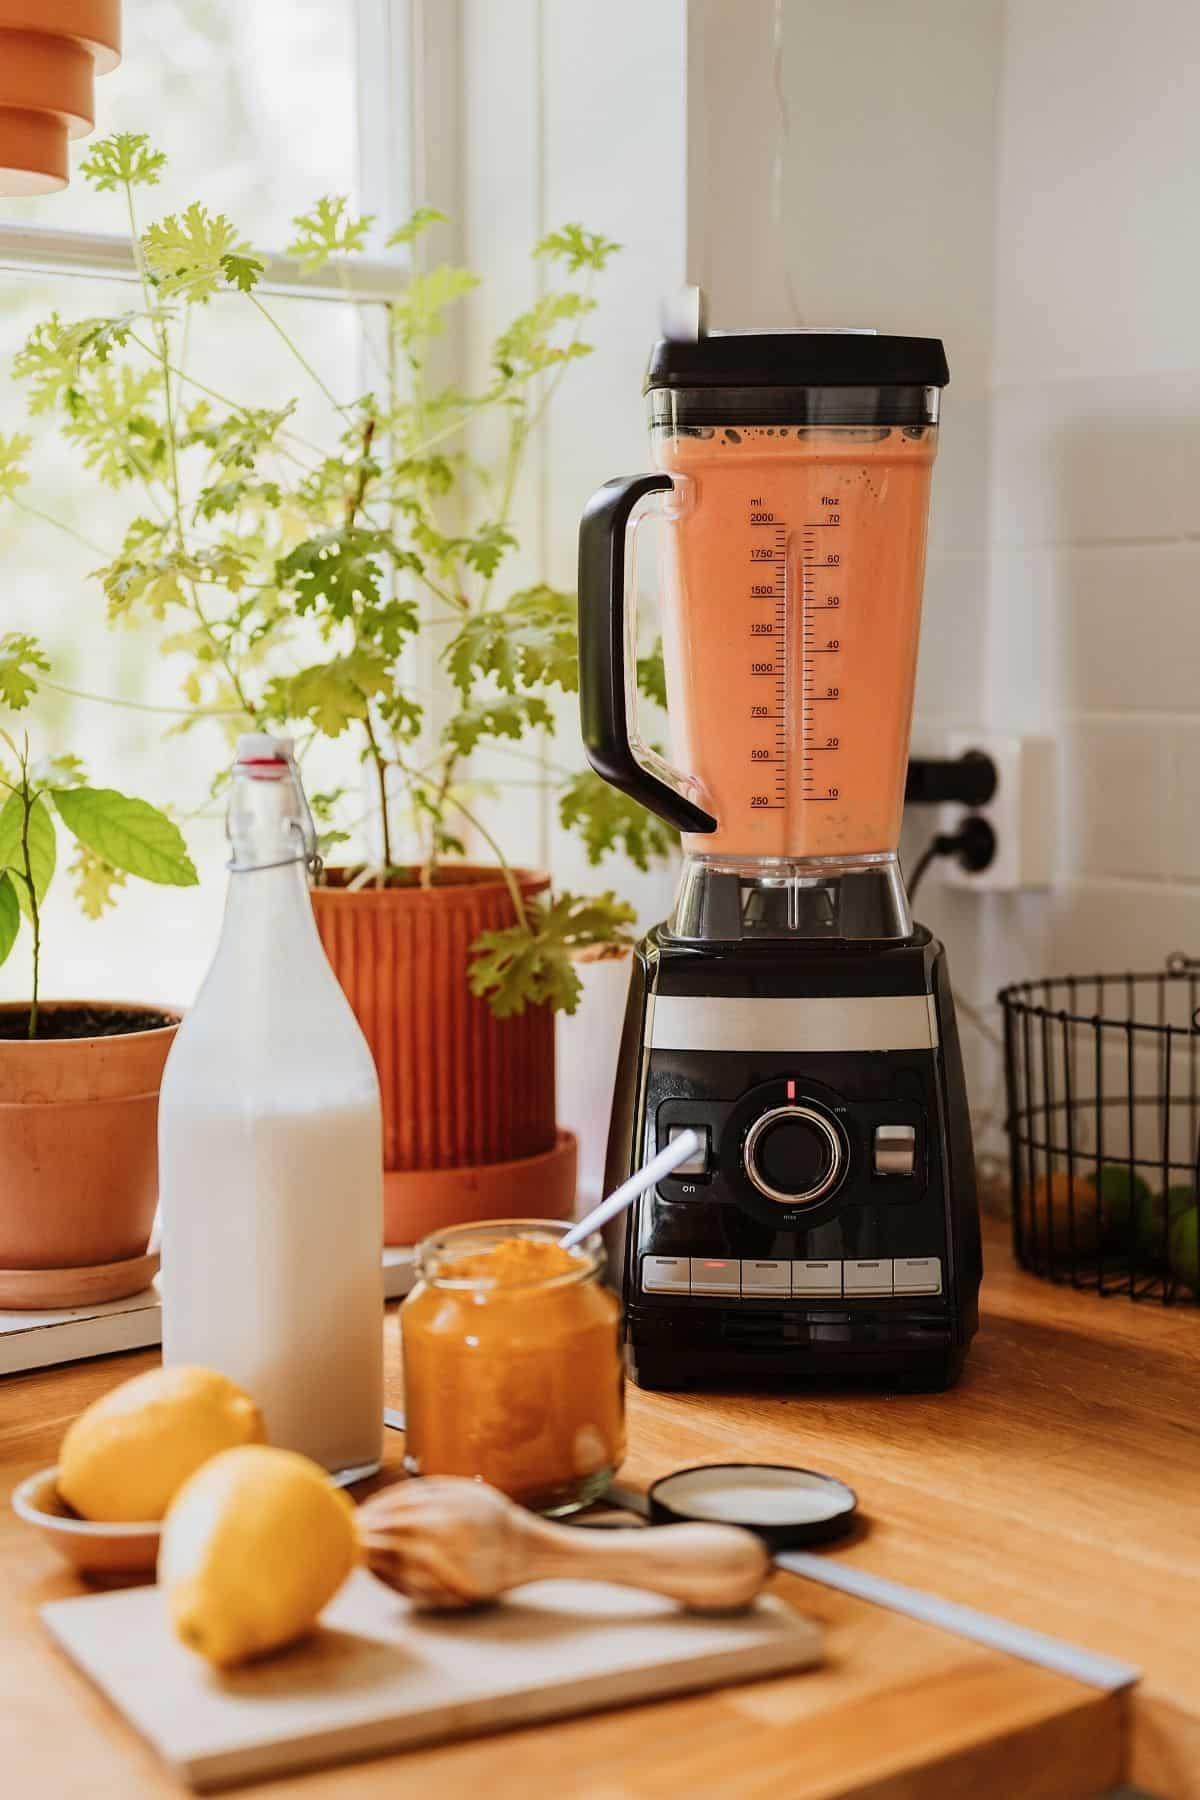 high powdered blender filled with orange smoothie